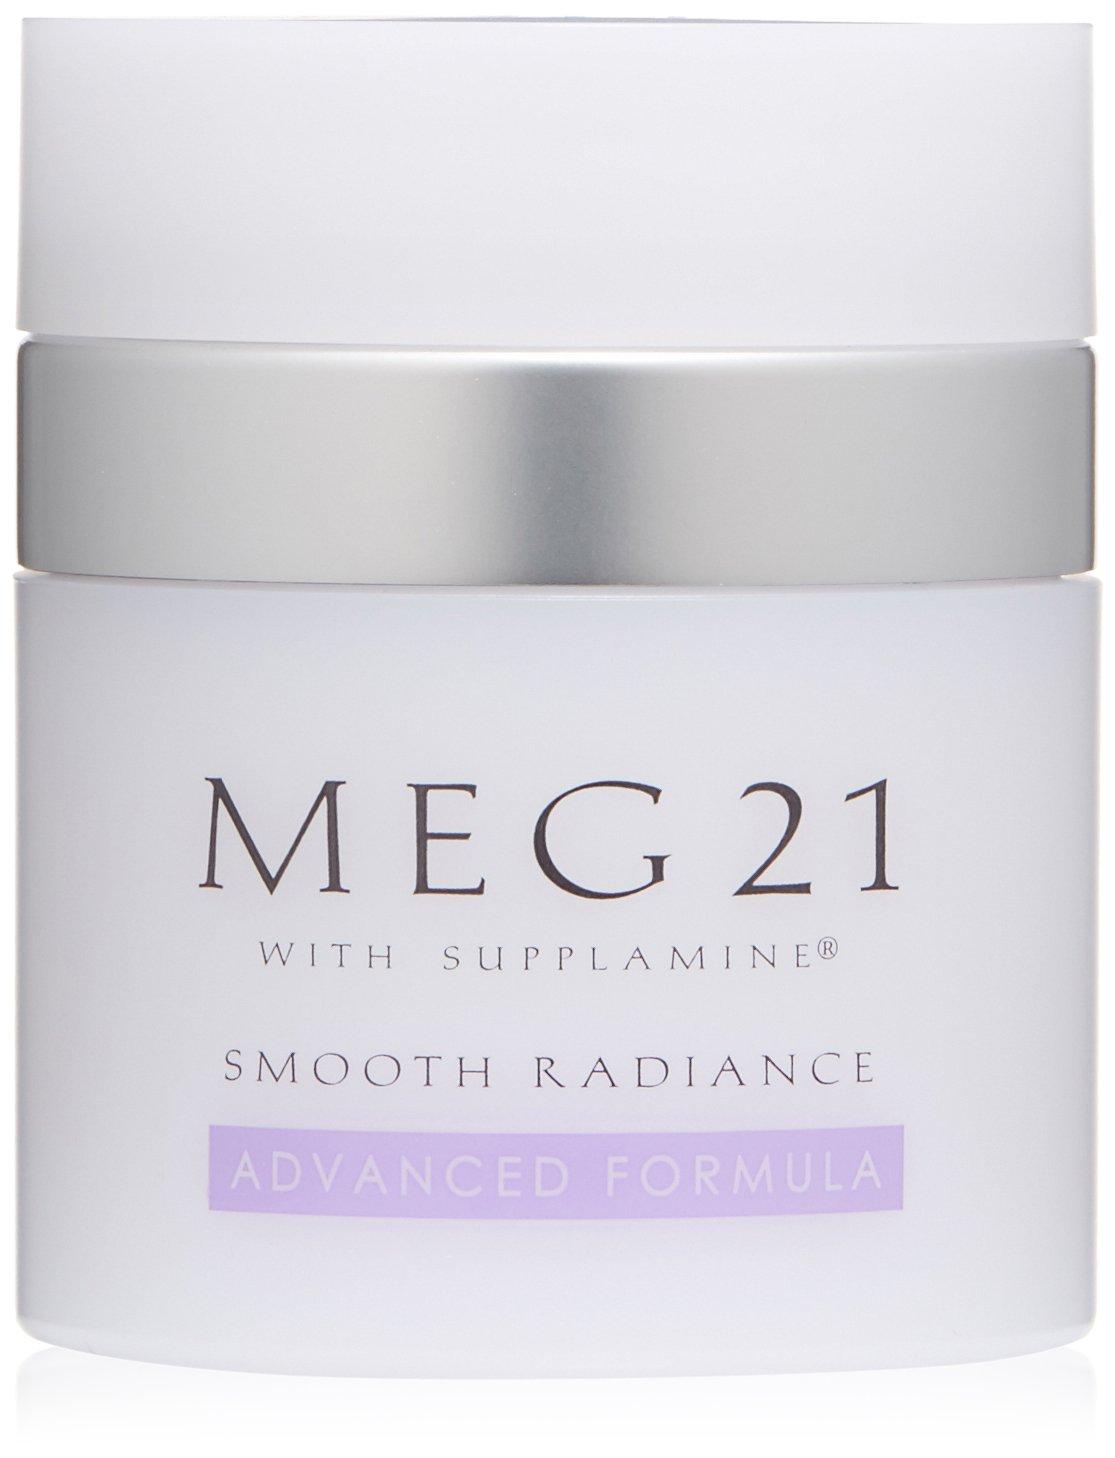 MEG 21 Smooth Radiance Advanced Formula, 1.7 Oz